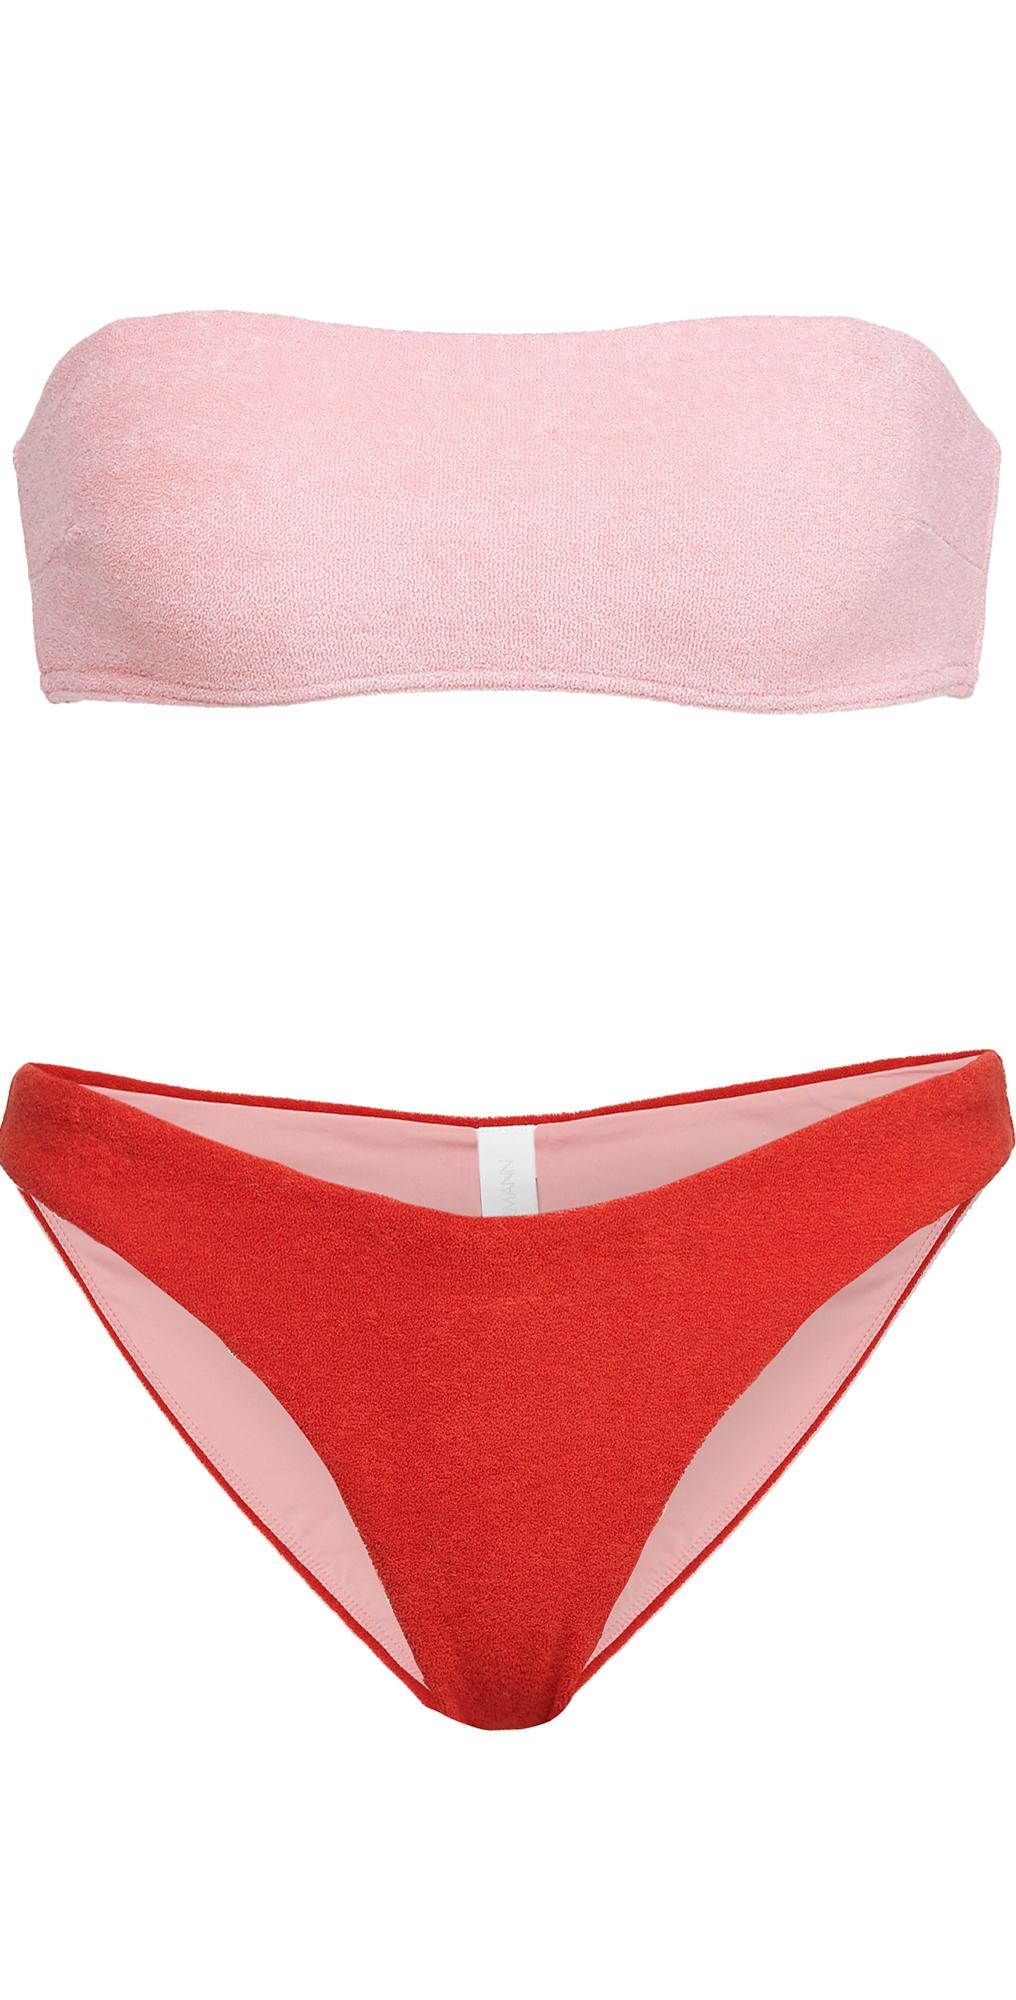 Zimmermann Poppy Terry Bandeau Bikini Set